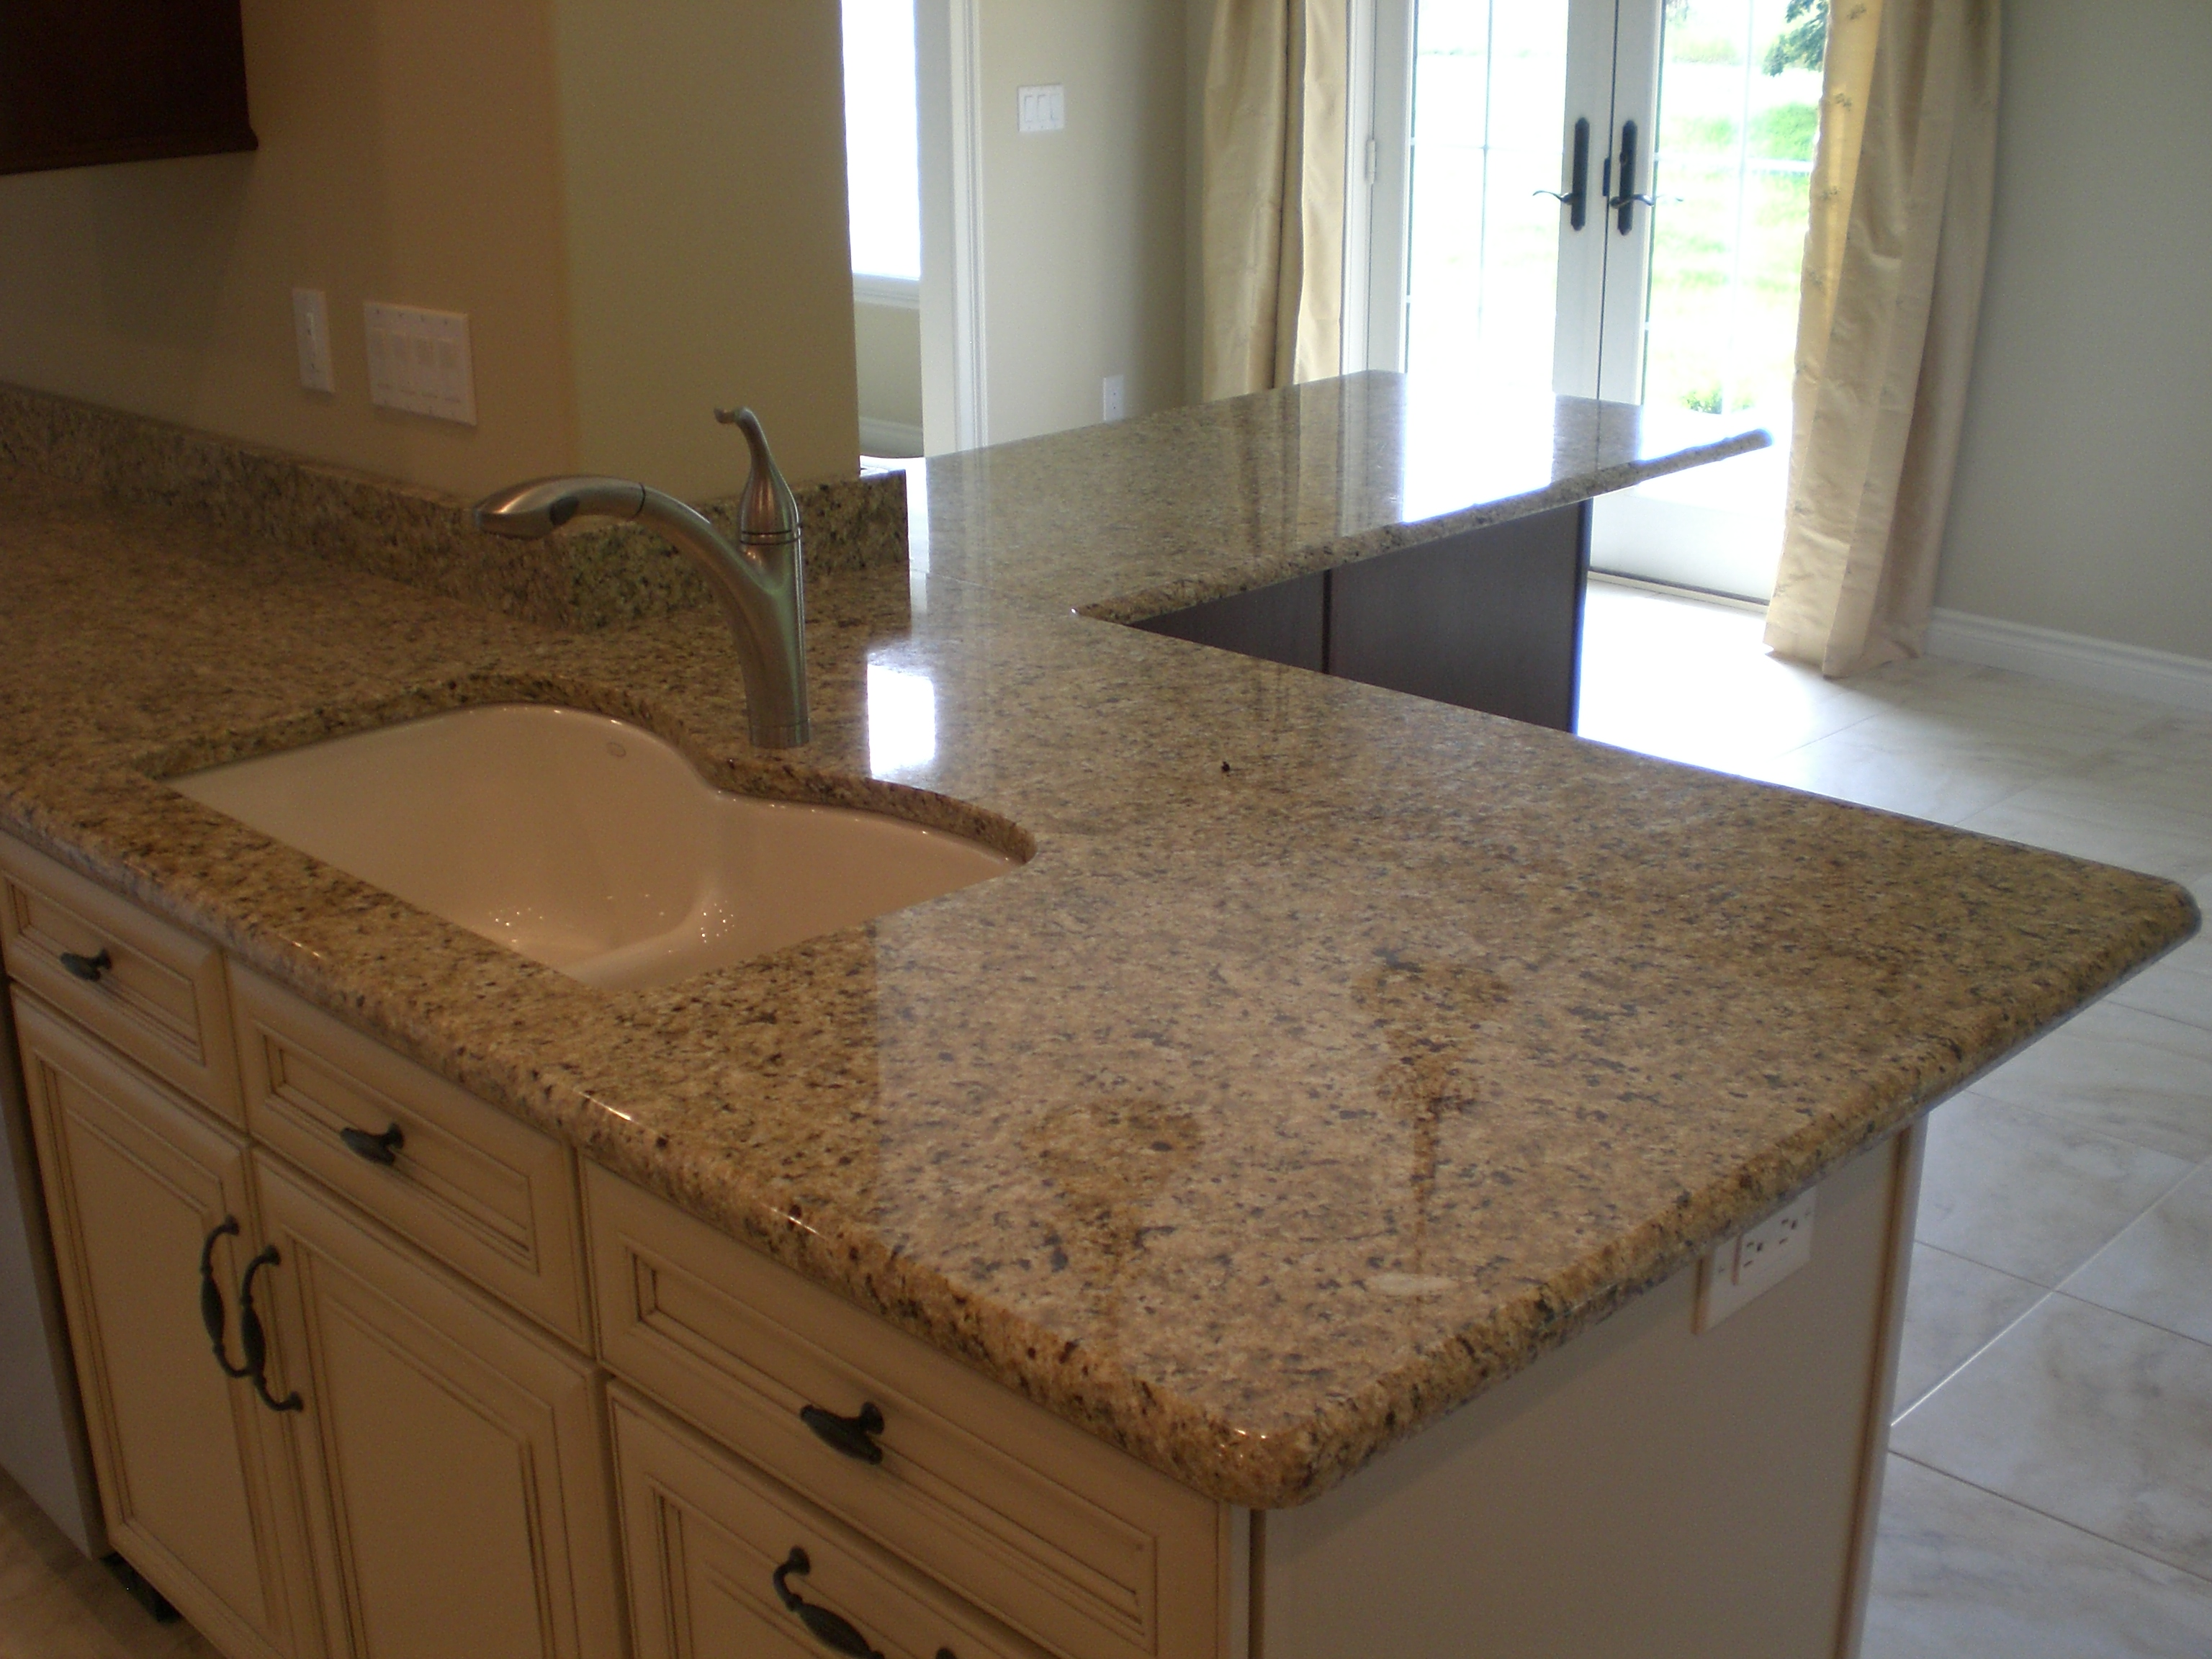 Venetian Gold Granite Kitchen White Kitchen Cabinets With New Venetian Gold